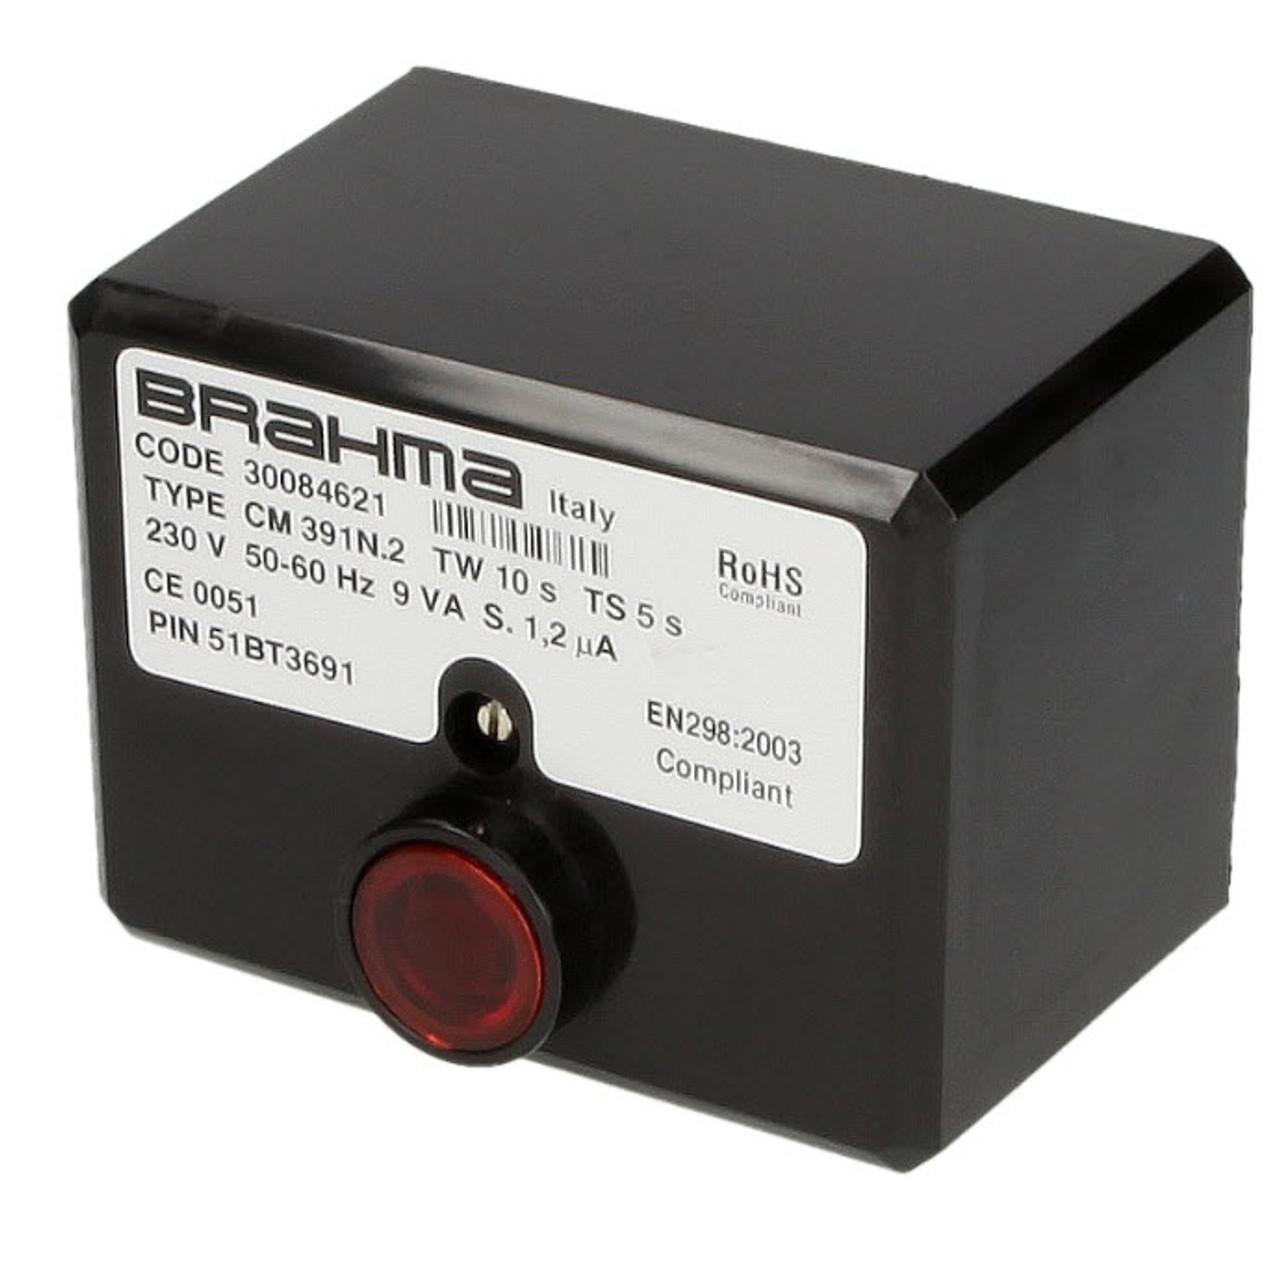 Brahma control unit CM391.2, 30085681